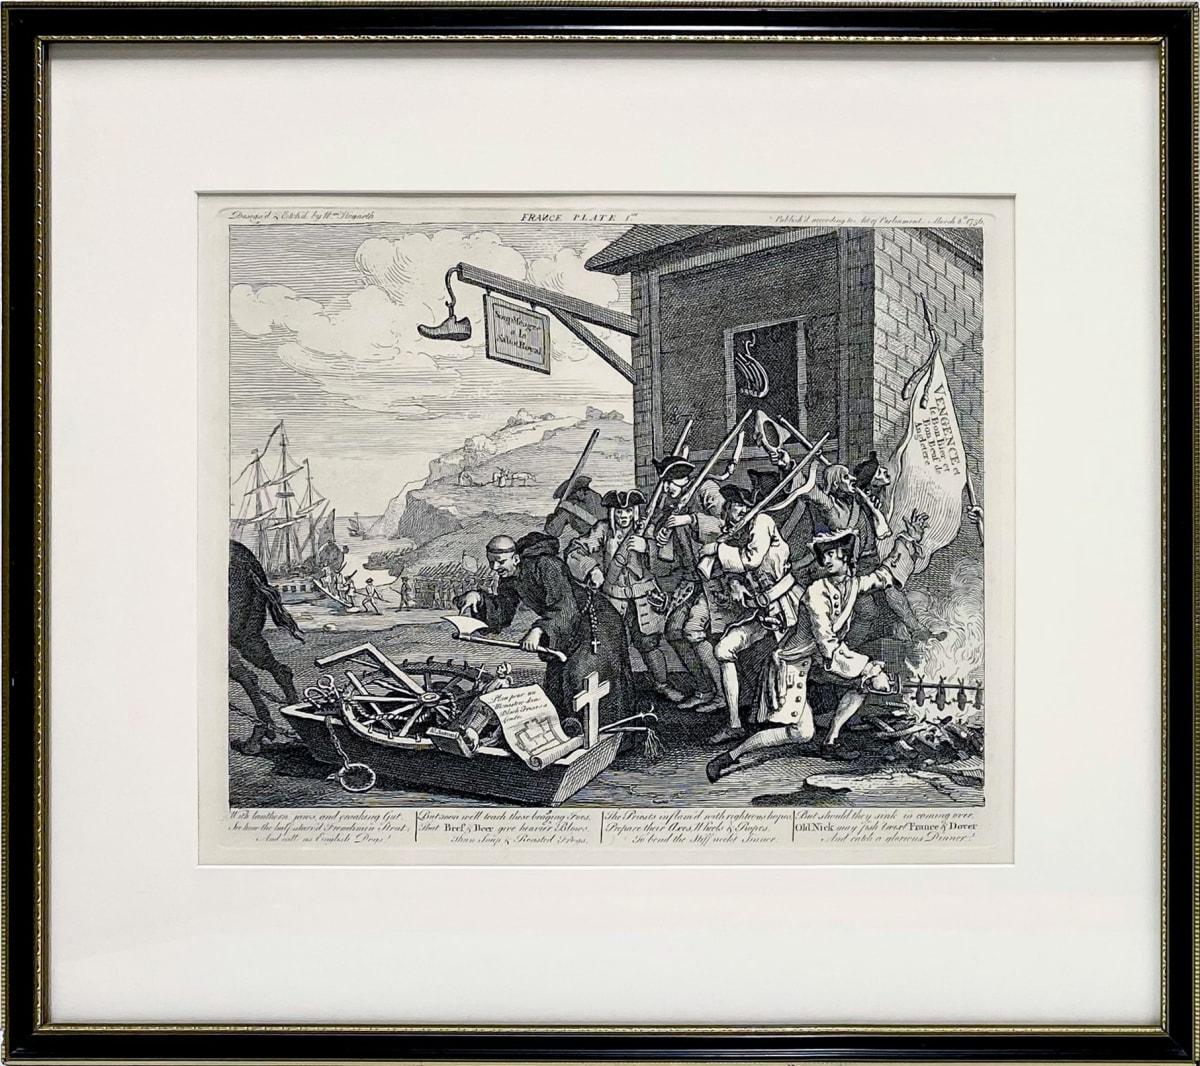 3219 - France, Plate 1 by William Hogarth (1697 – 1764)